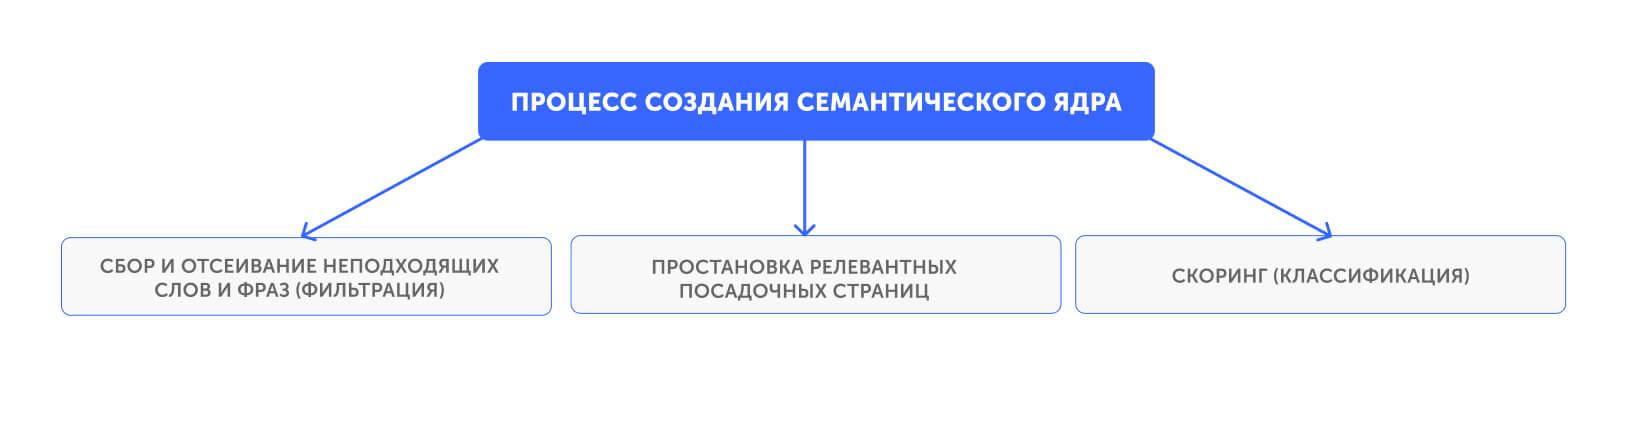 Процесс создания семантического ядра